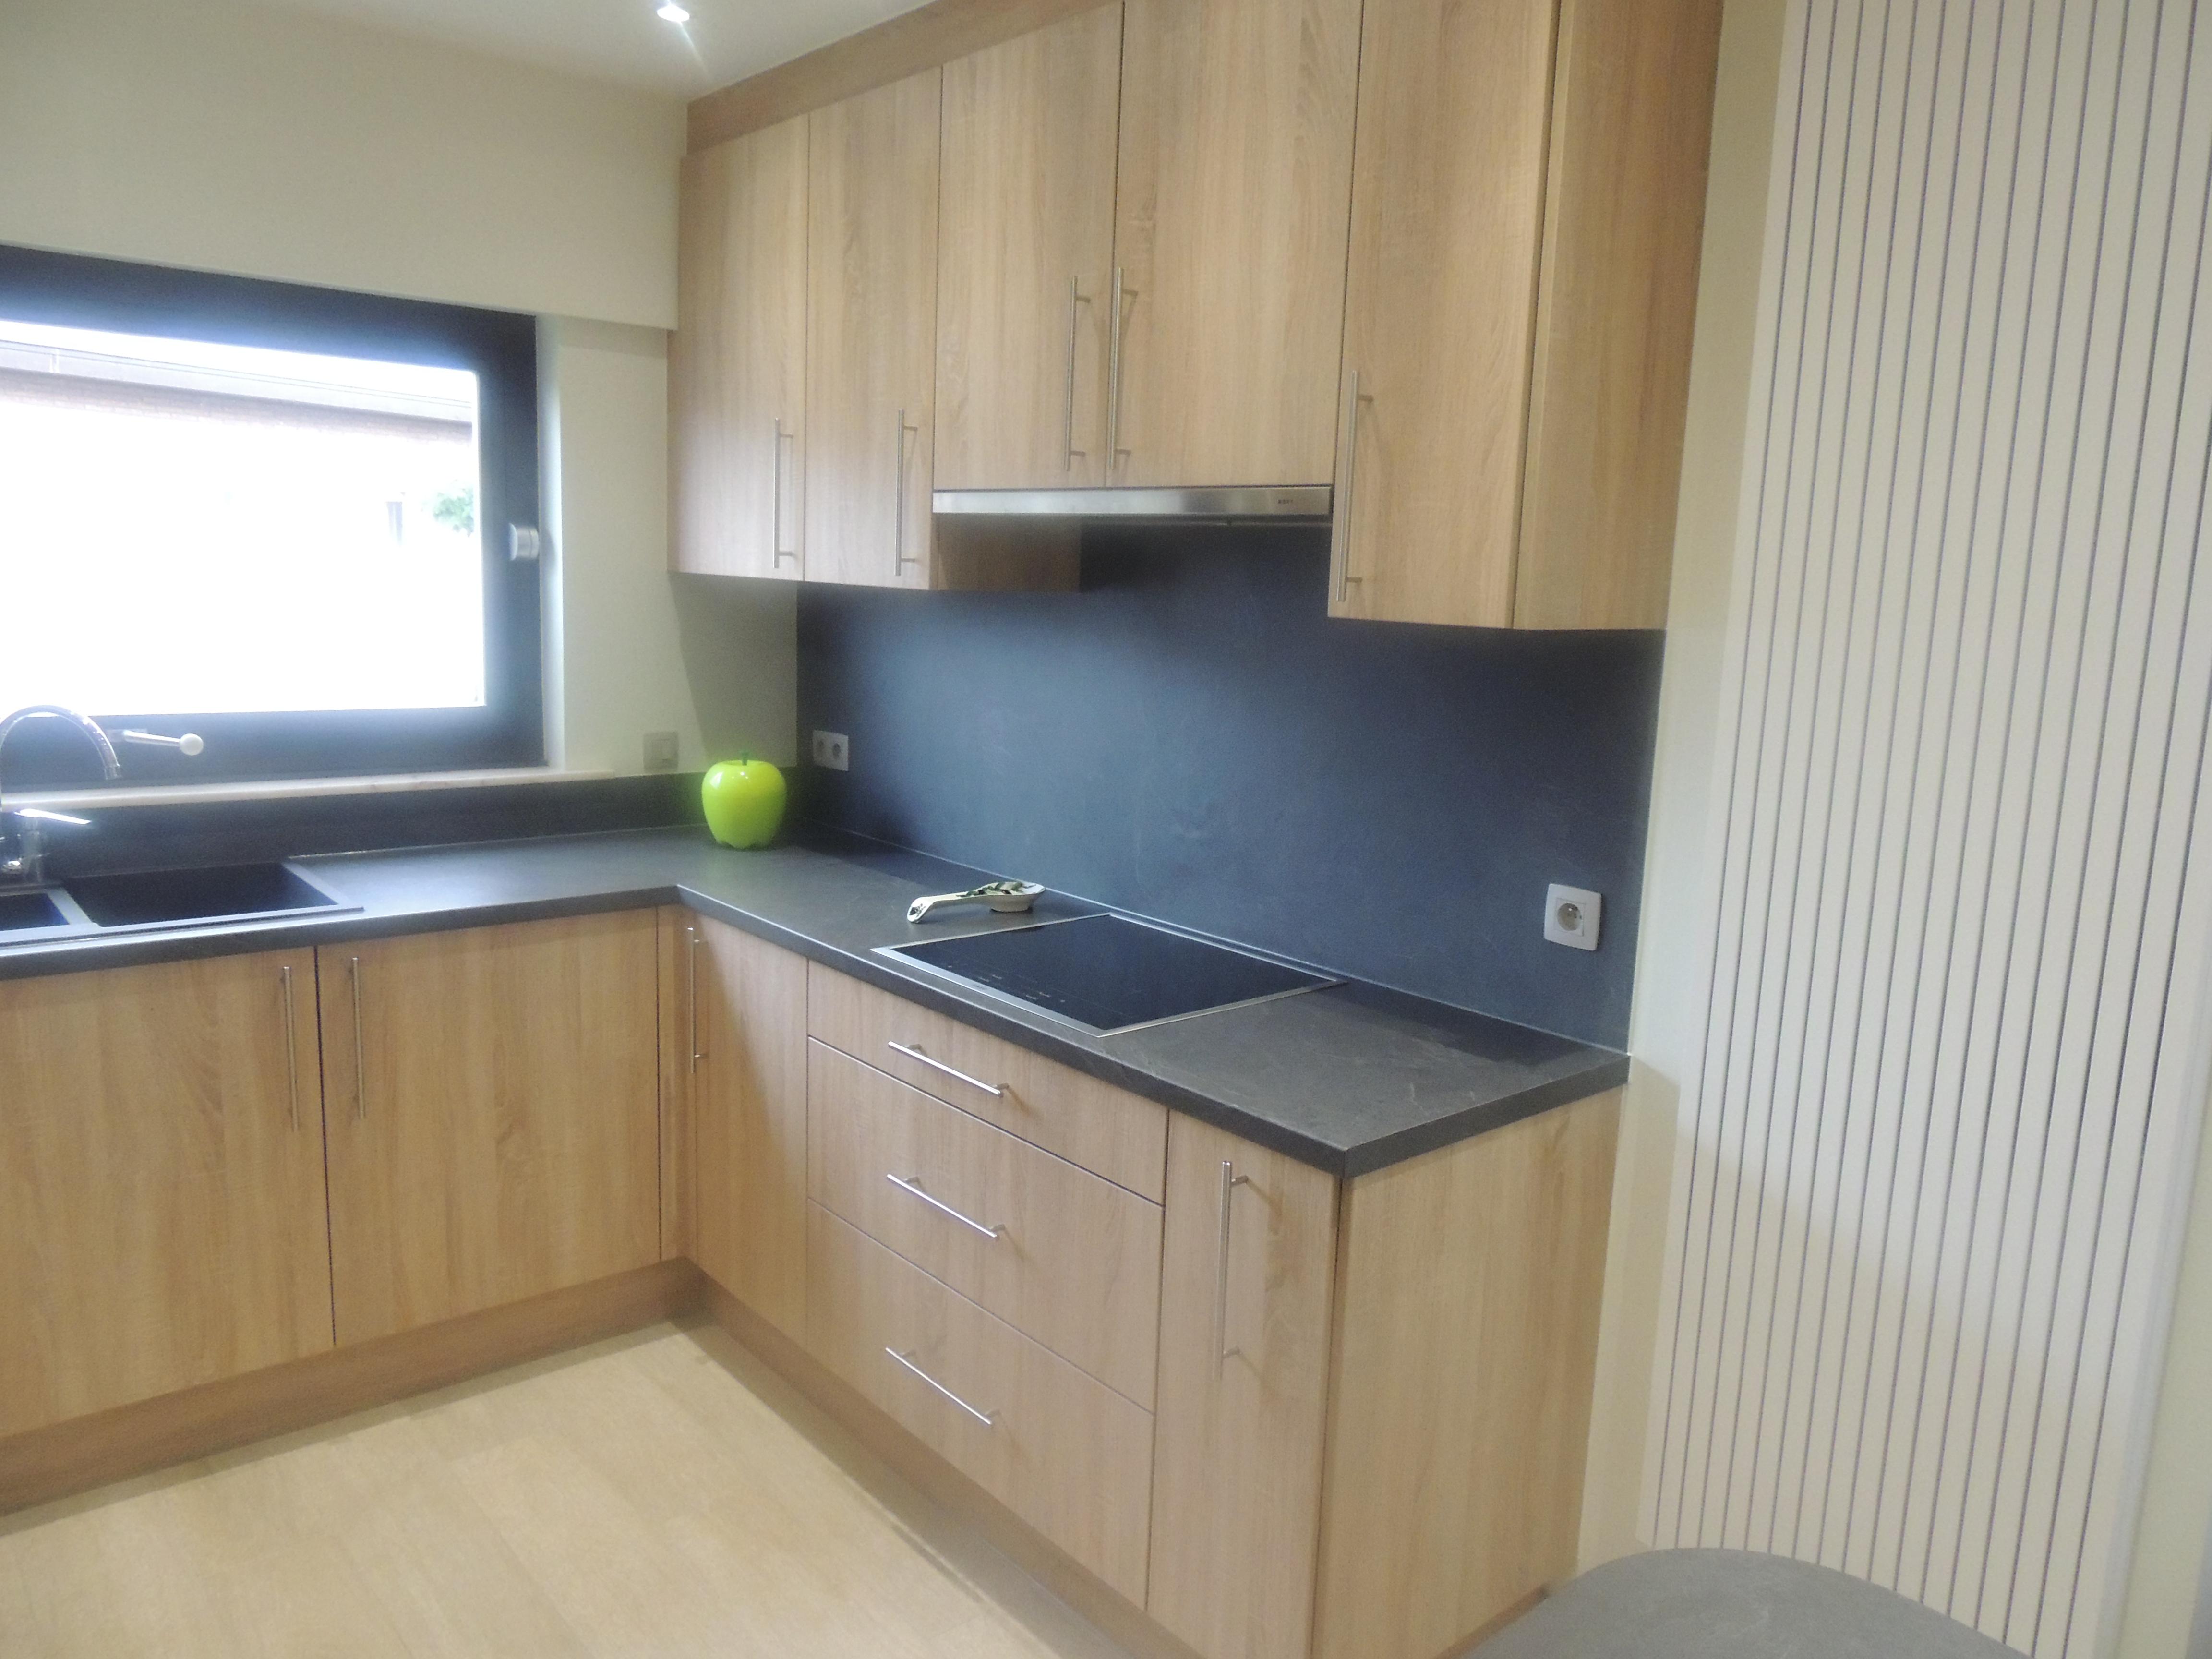 Keuken bruin 2